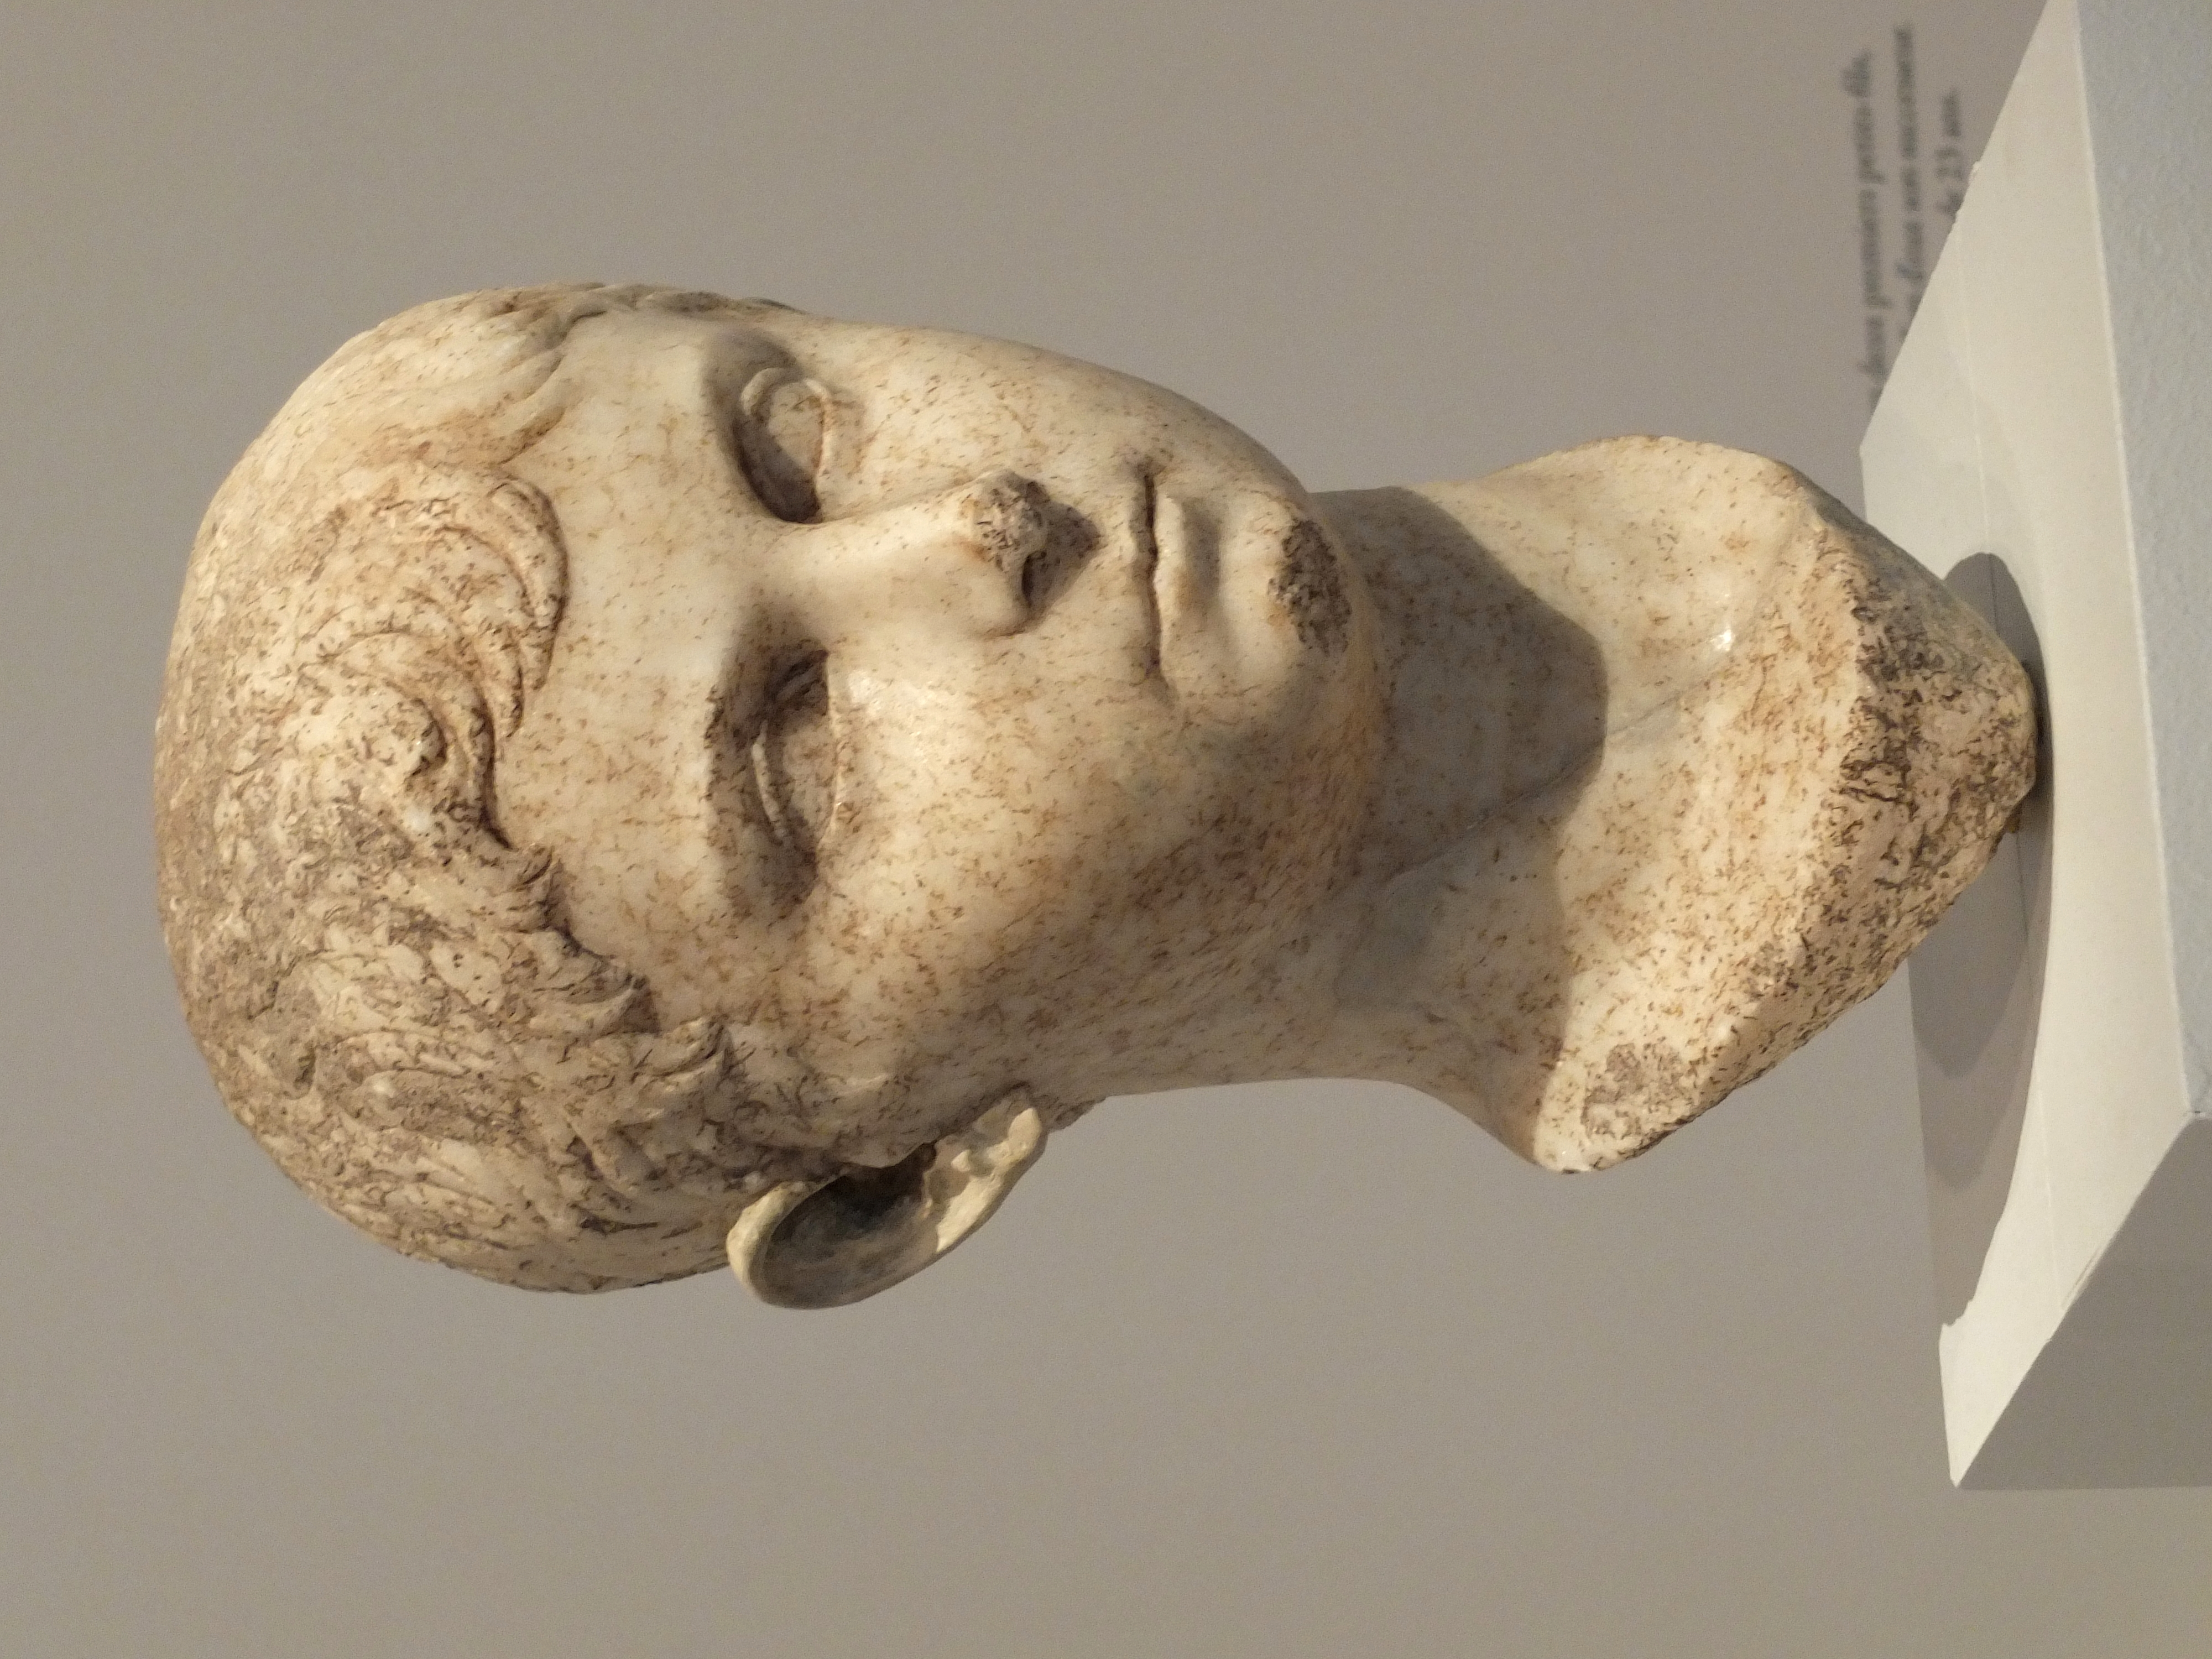 Caius César Rome 2 augGP2014.jpg